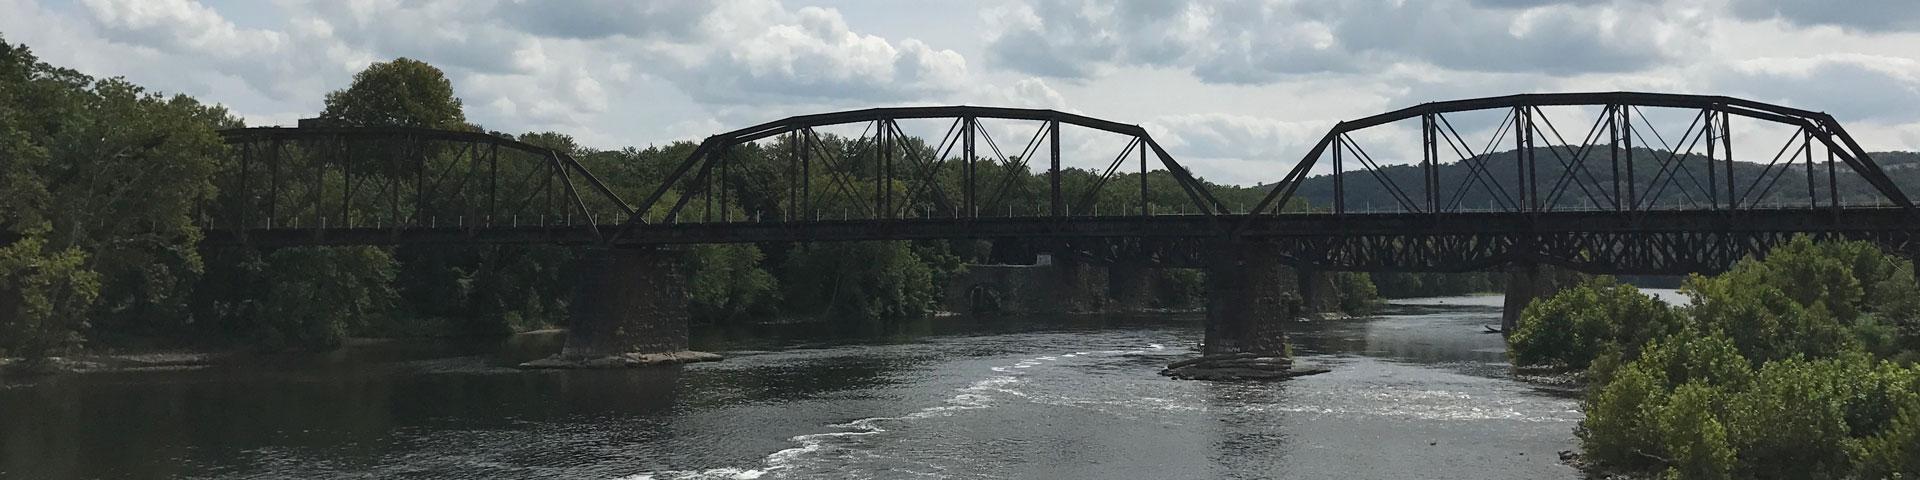 A large steel railroad bridge crosses a river.